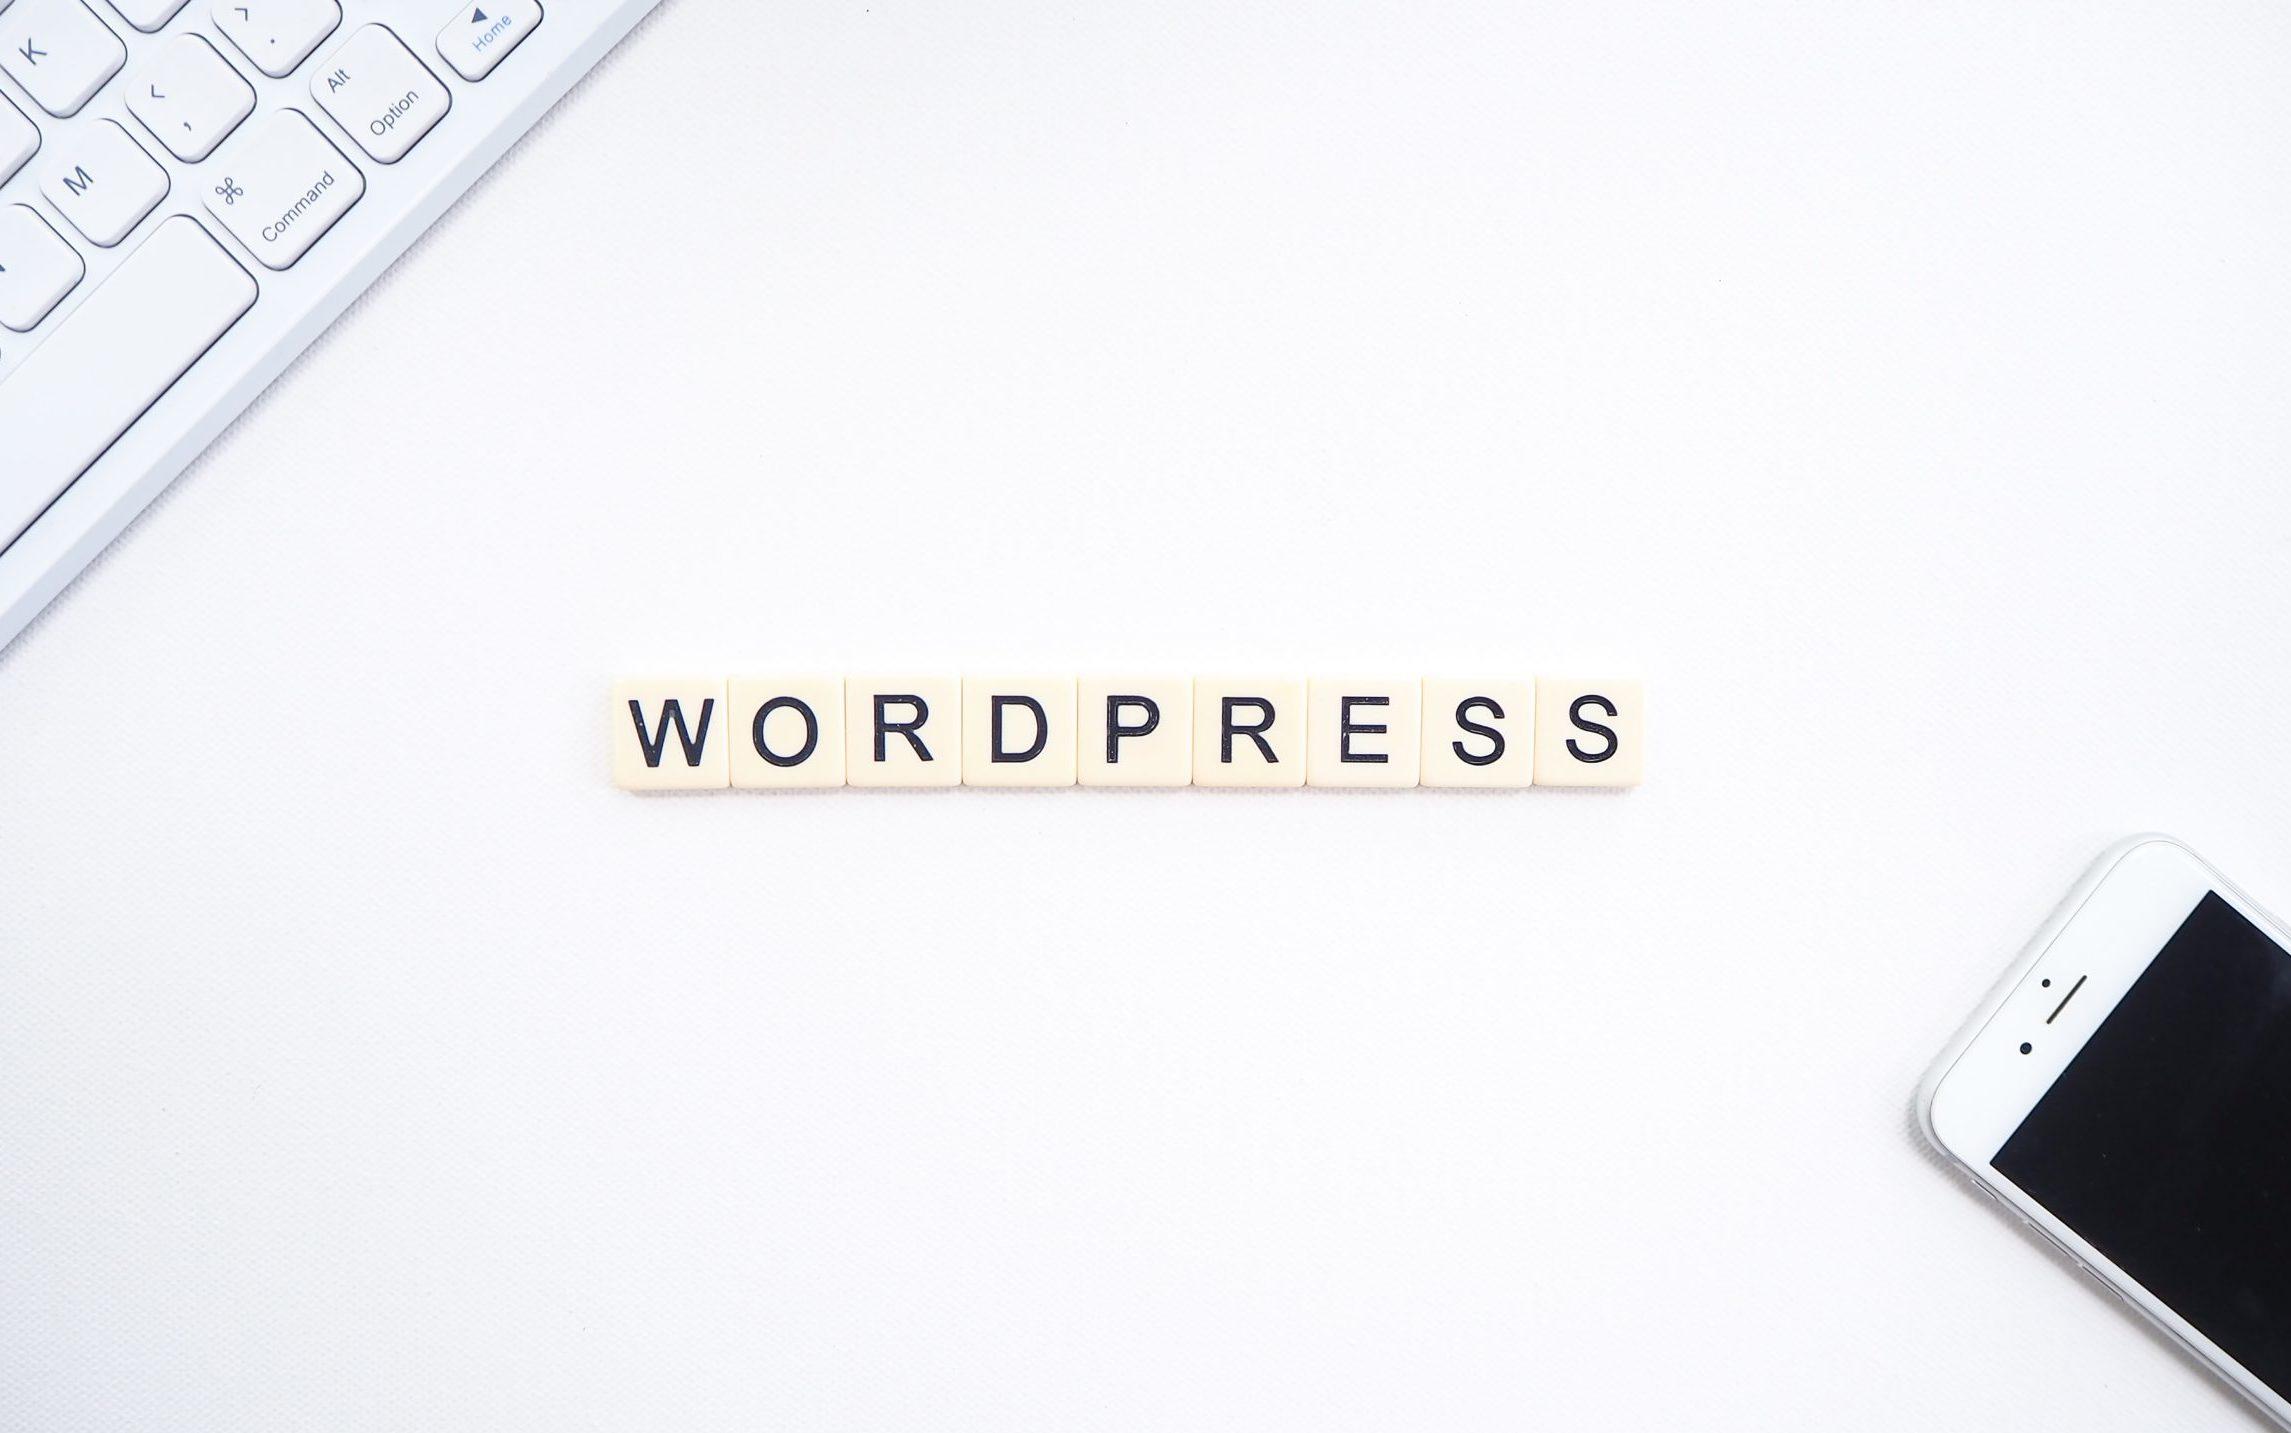 WordPress!初心者でも簡単に始められるすごい本と効率的な使い方のアイキャッチ画像